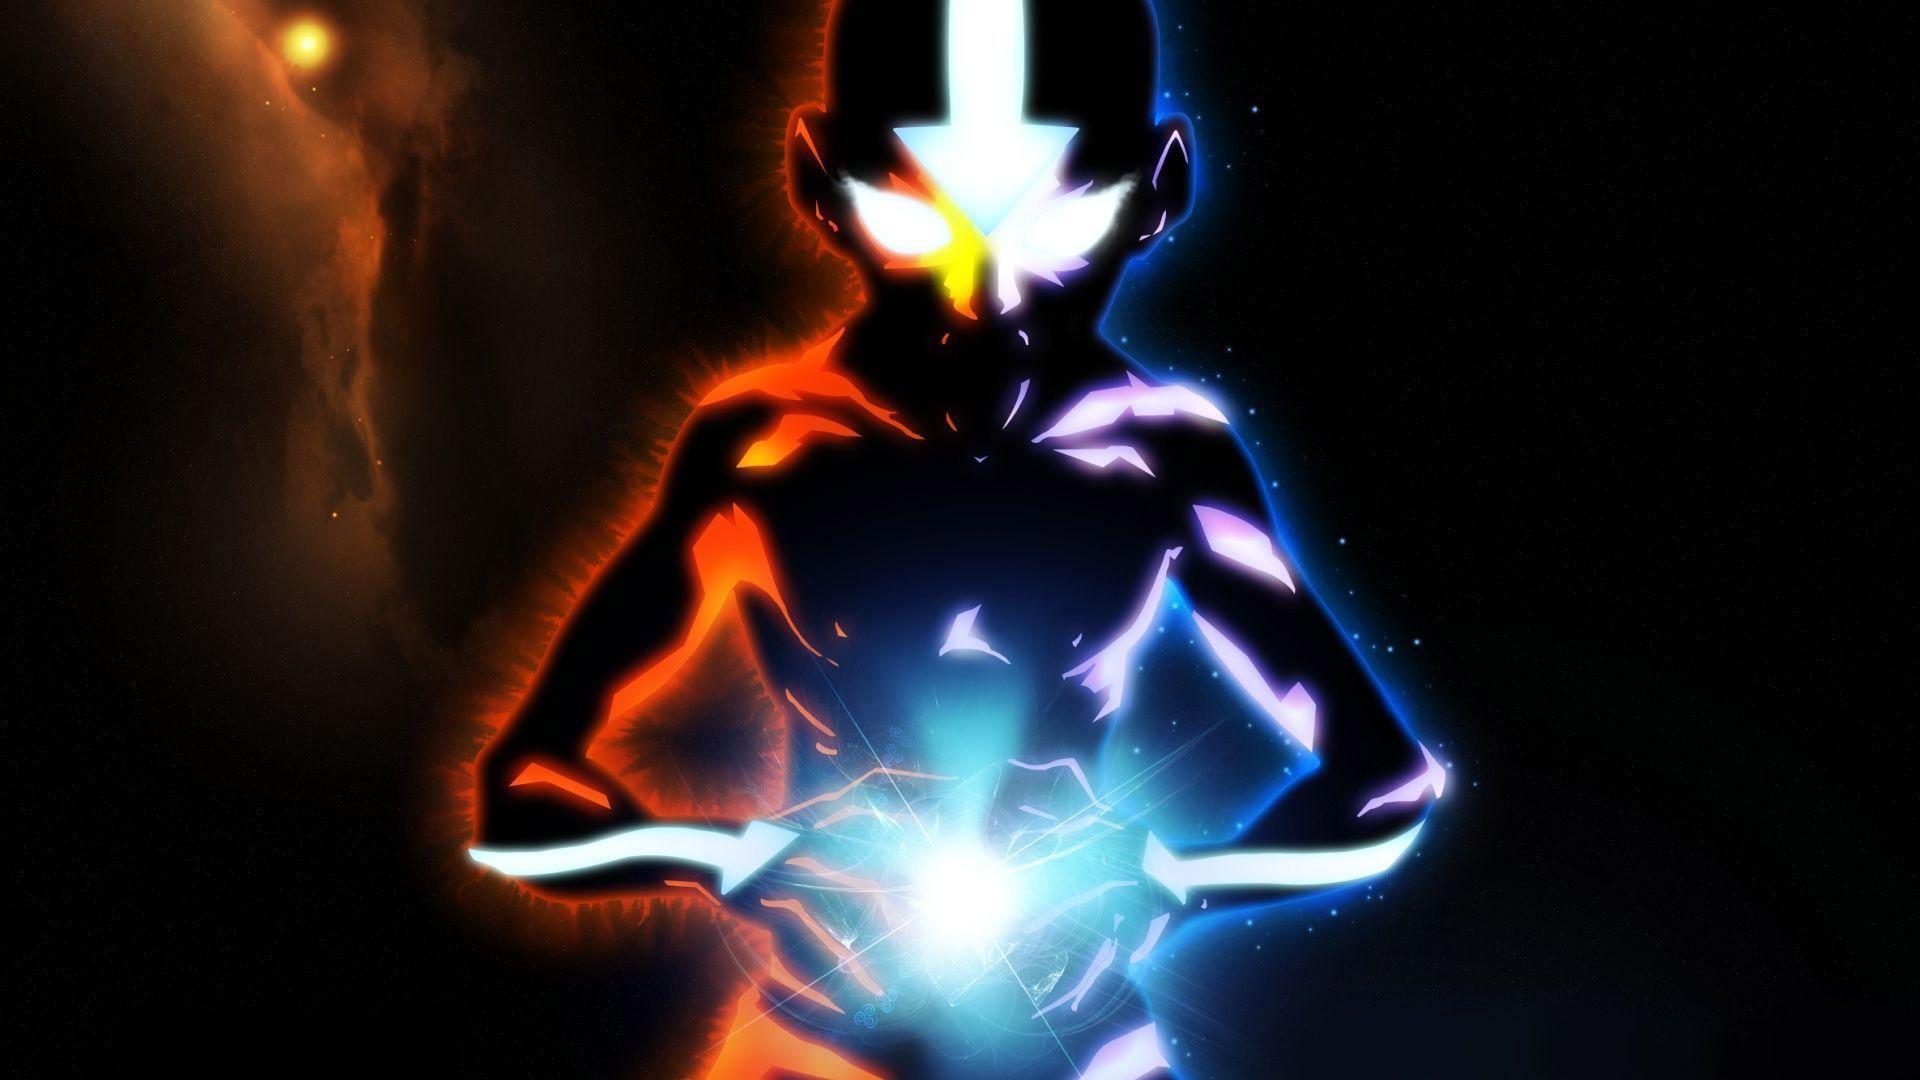 avatar airbender wallpaper - photo #6